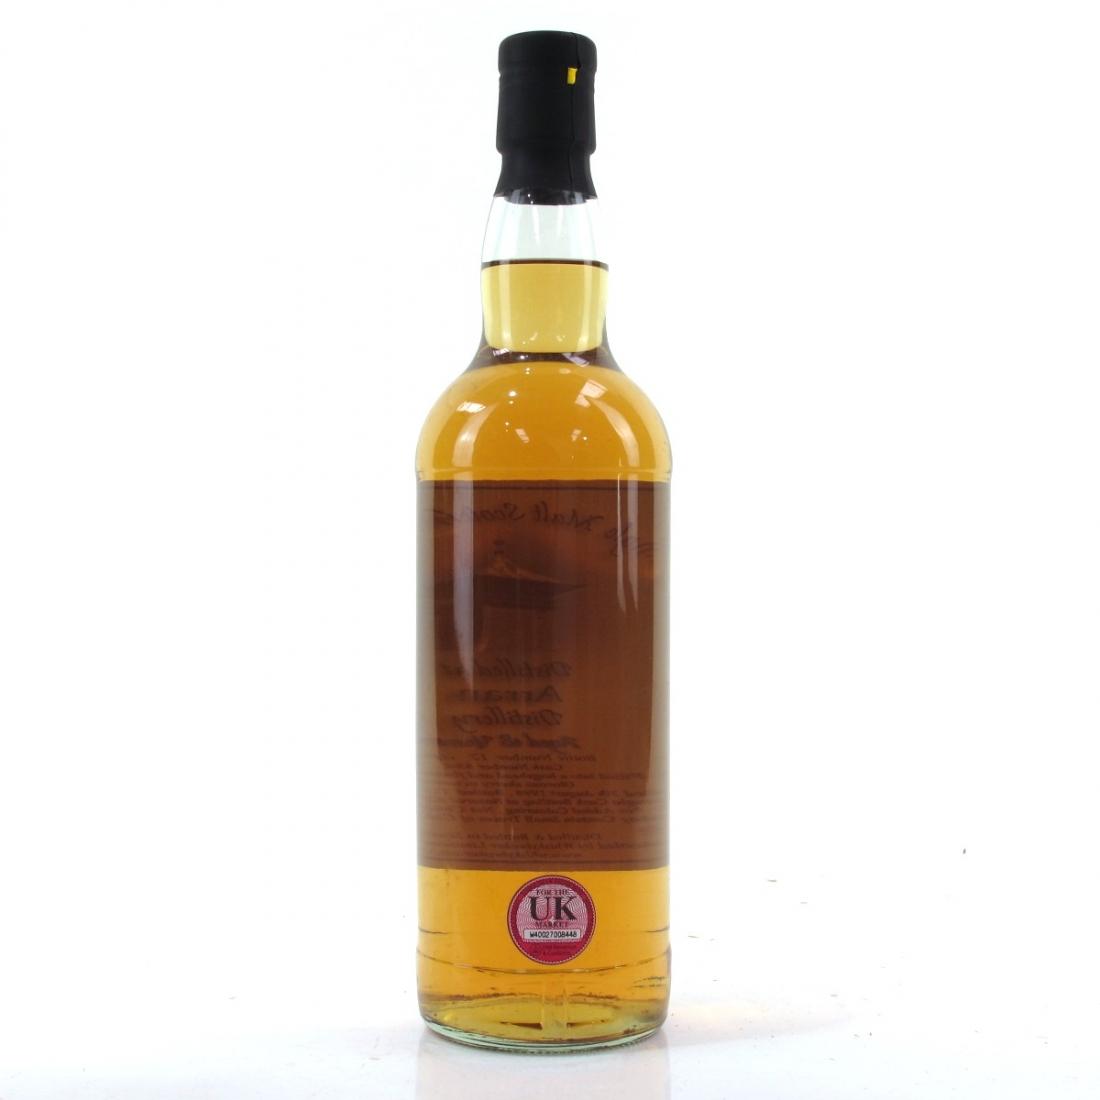 Arran 1996 Whisky Broker 18 Year Old / Oloroso Octave Finish